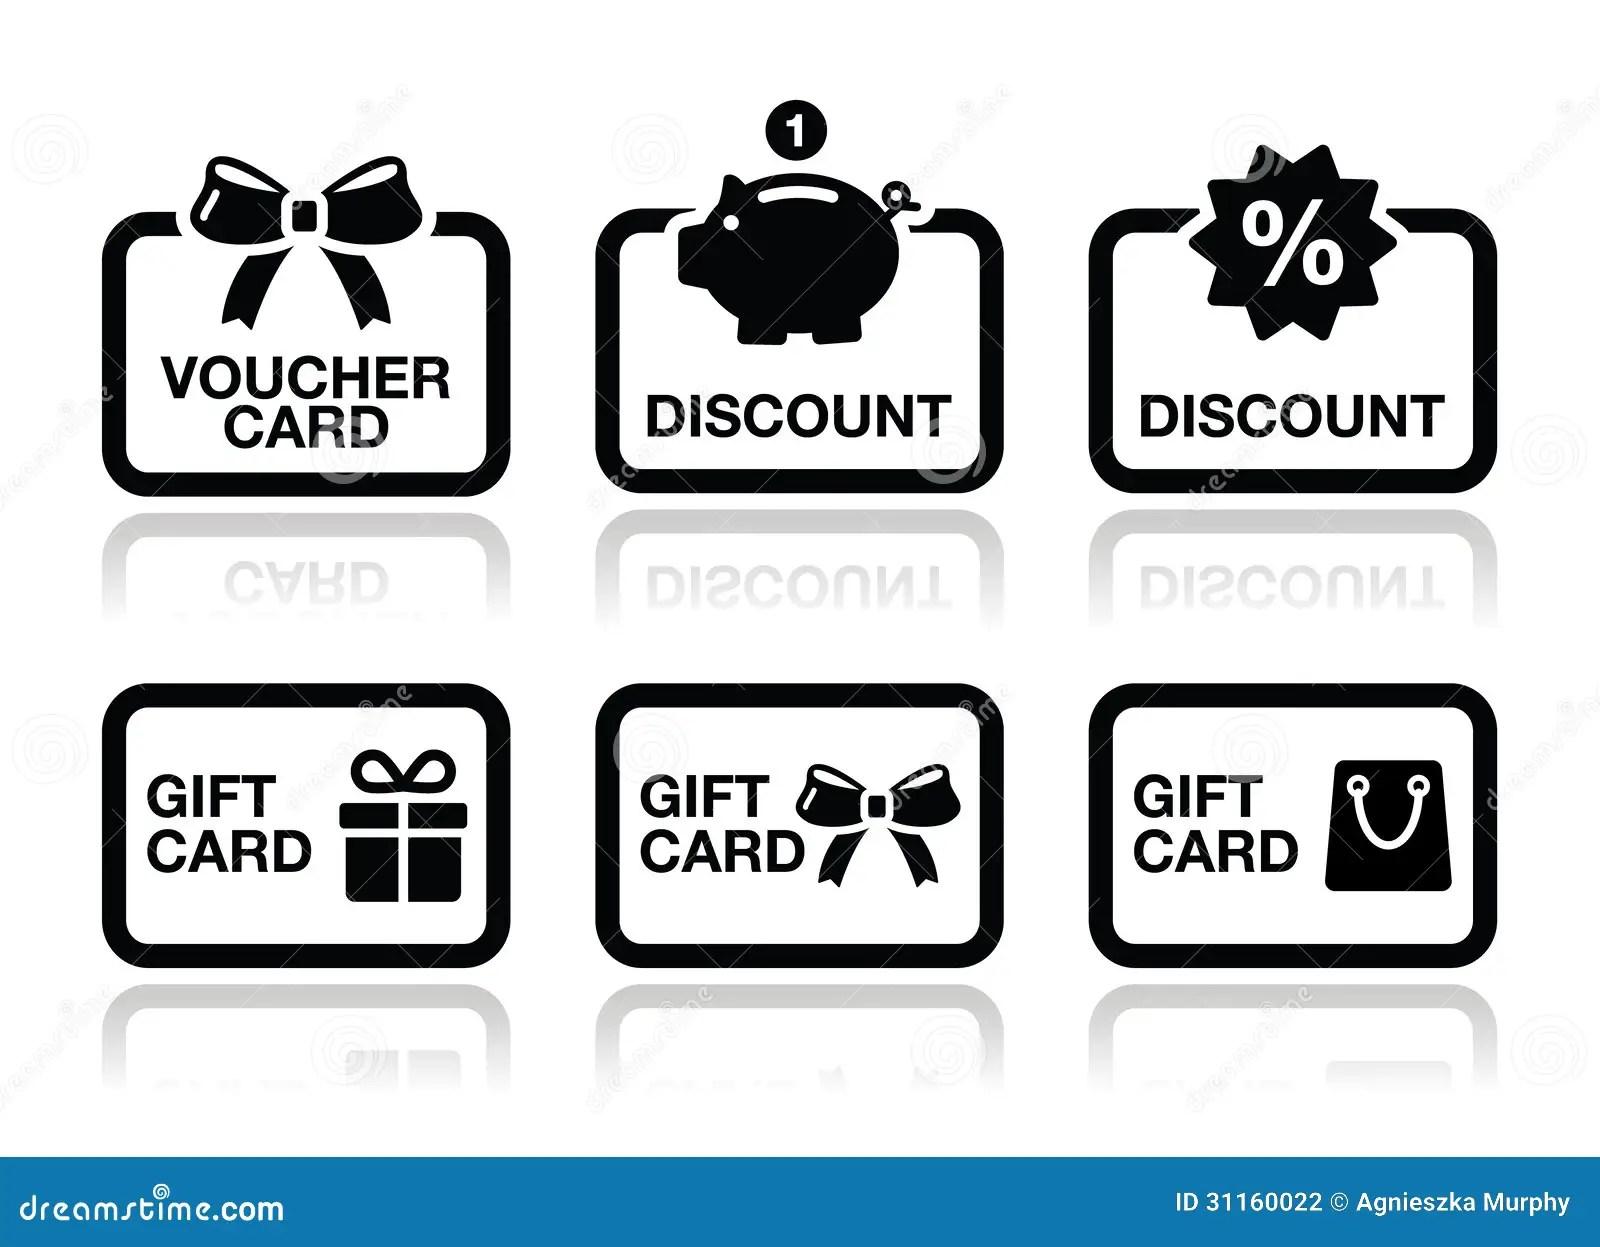 Voucher T Discount Card Vector Icons Set Stock Vector